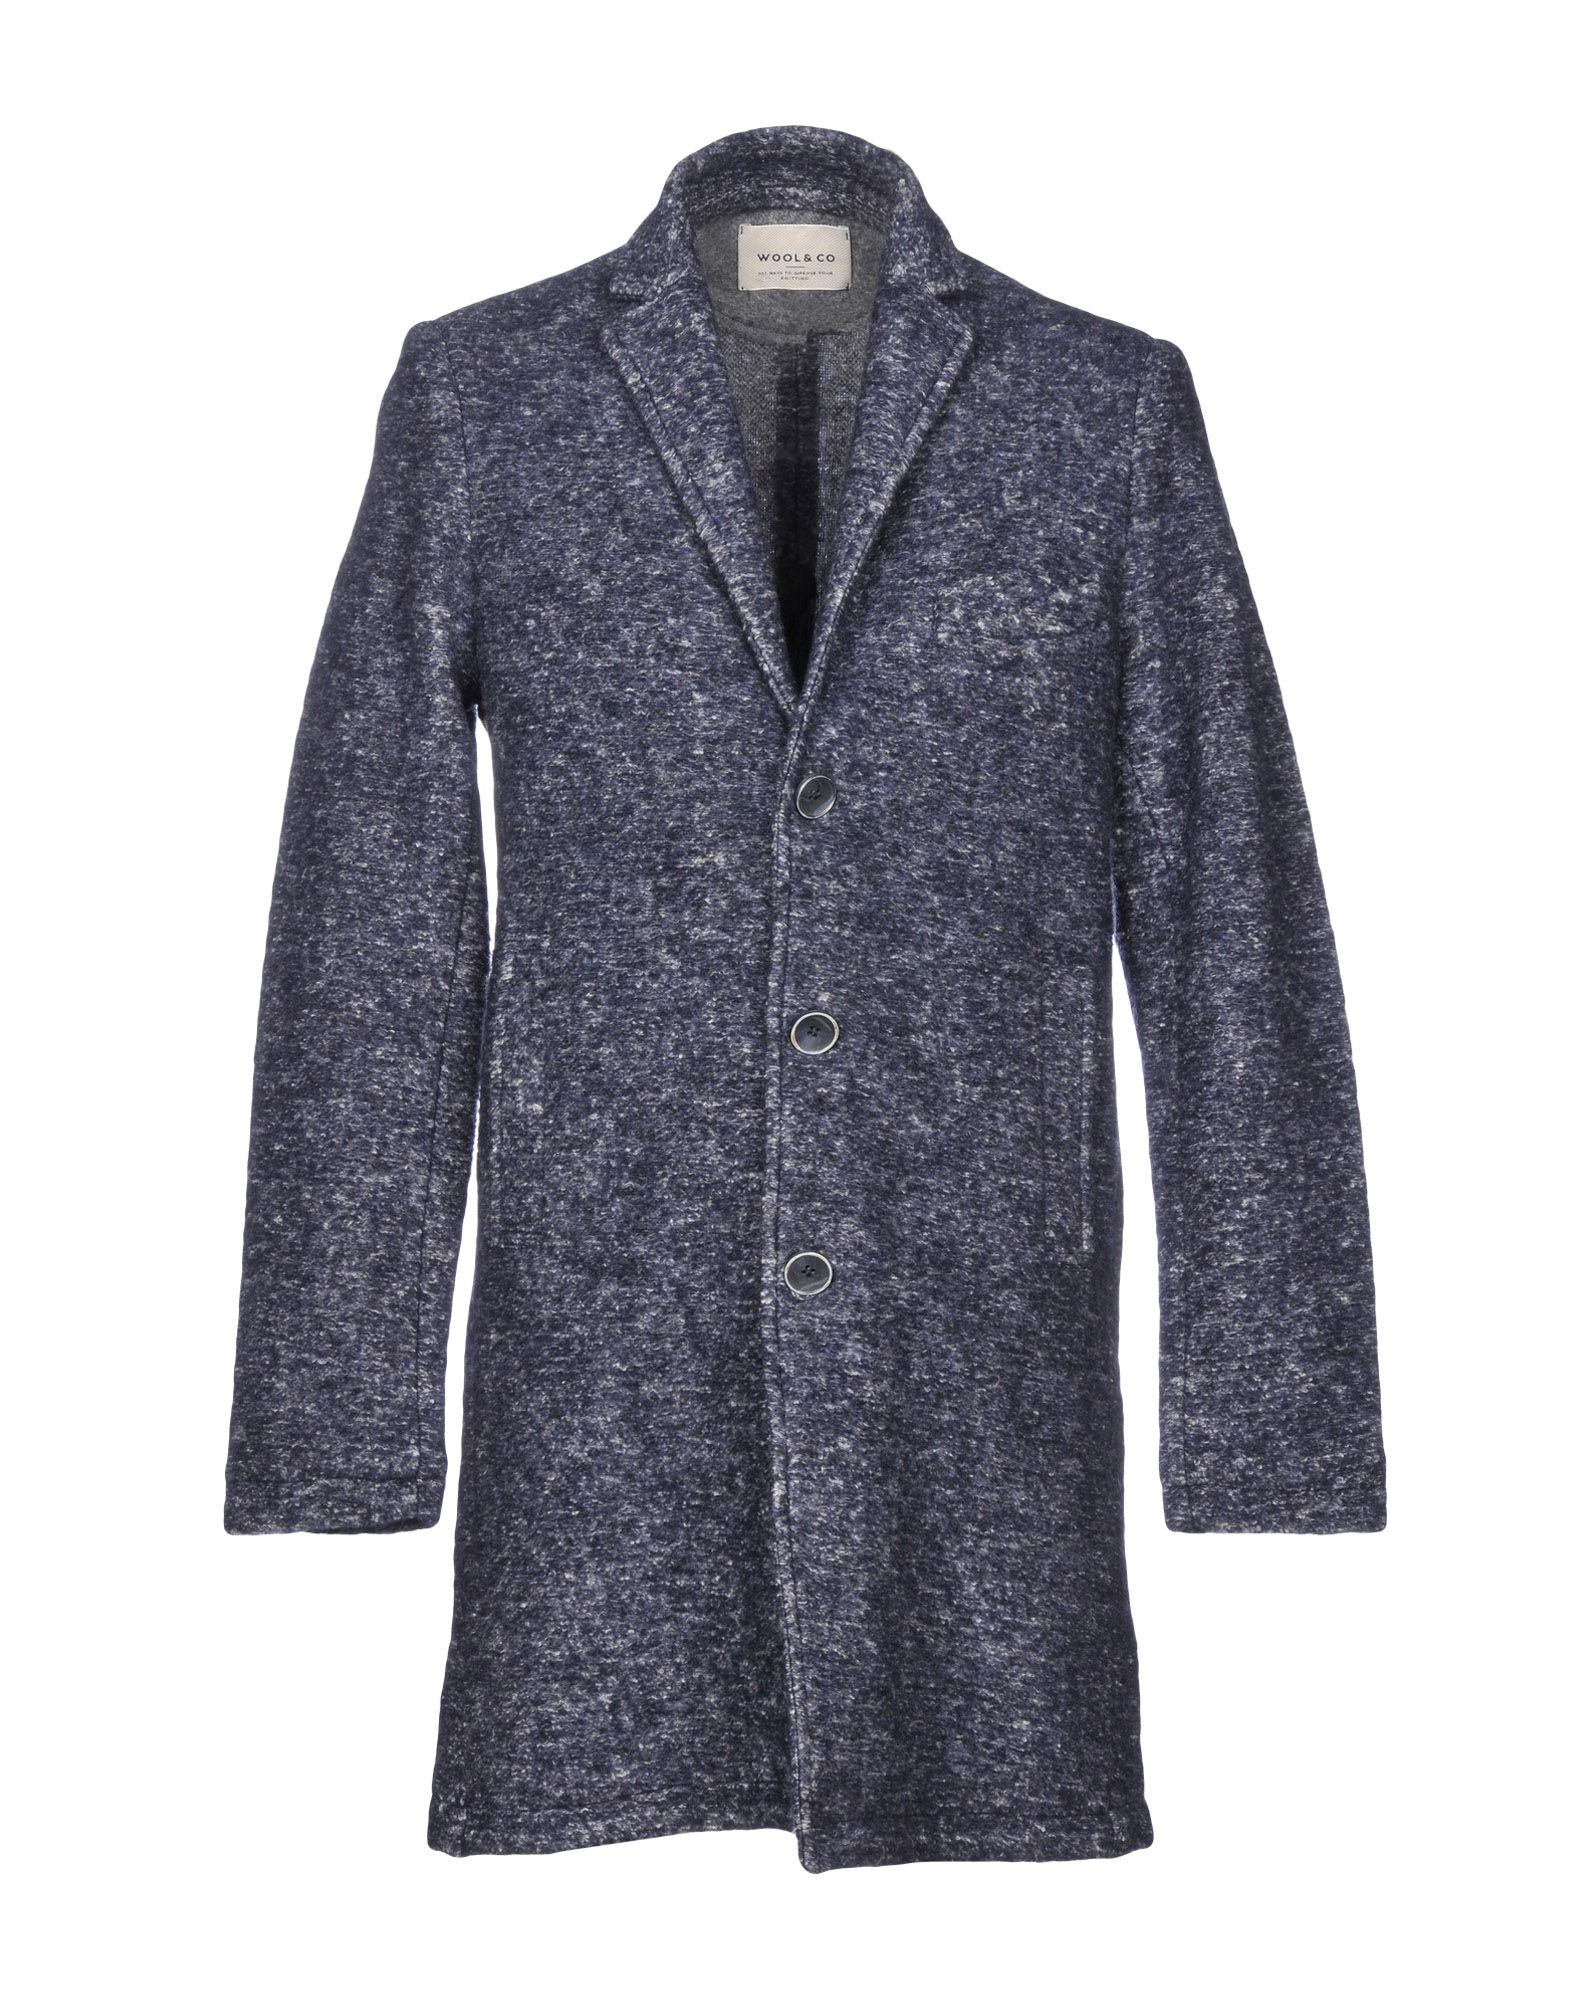 WOOL & CO Легкое пальто guess легкое пальто